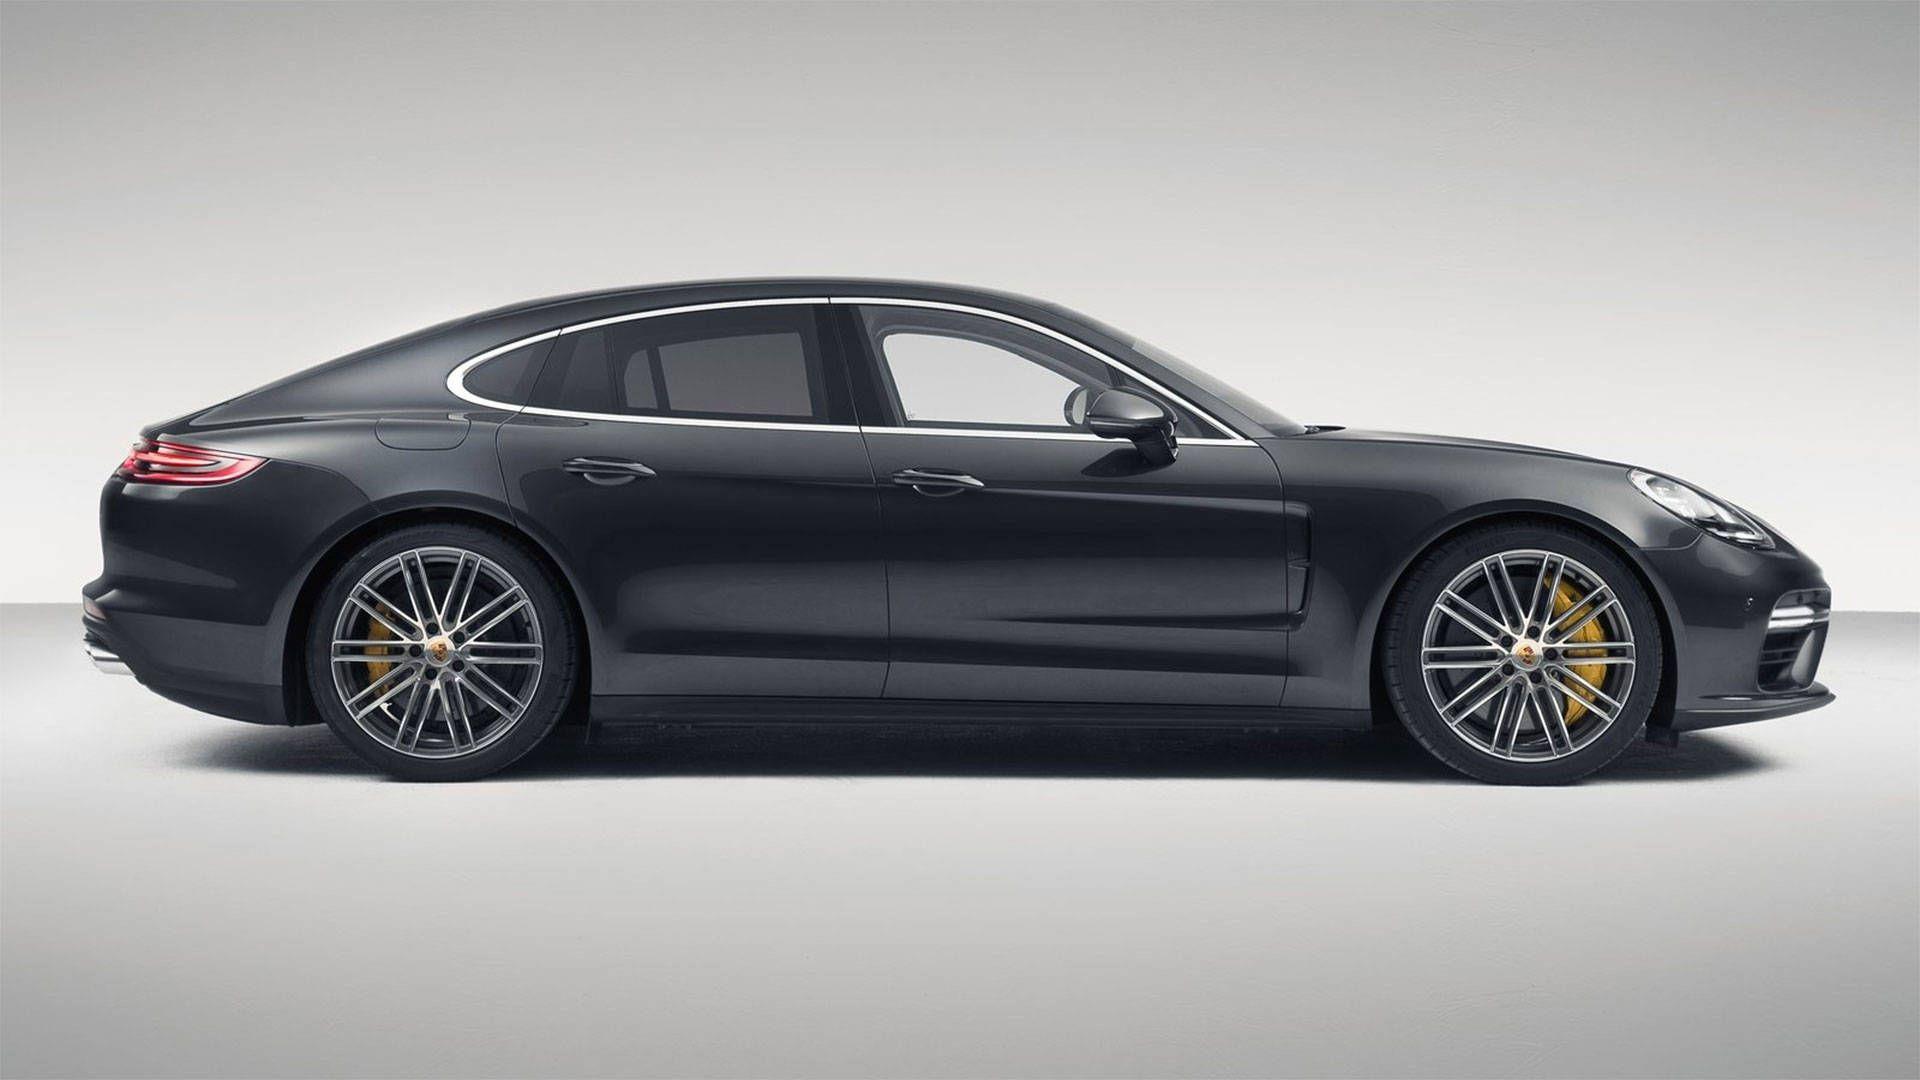 بورش باناميرا 2016 رفاهية لا تضاهي Luxury Life Amwal Porsche Panamera Luxury Hybrid Cars Porsche